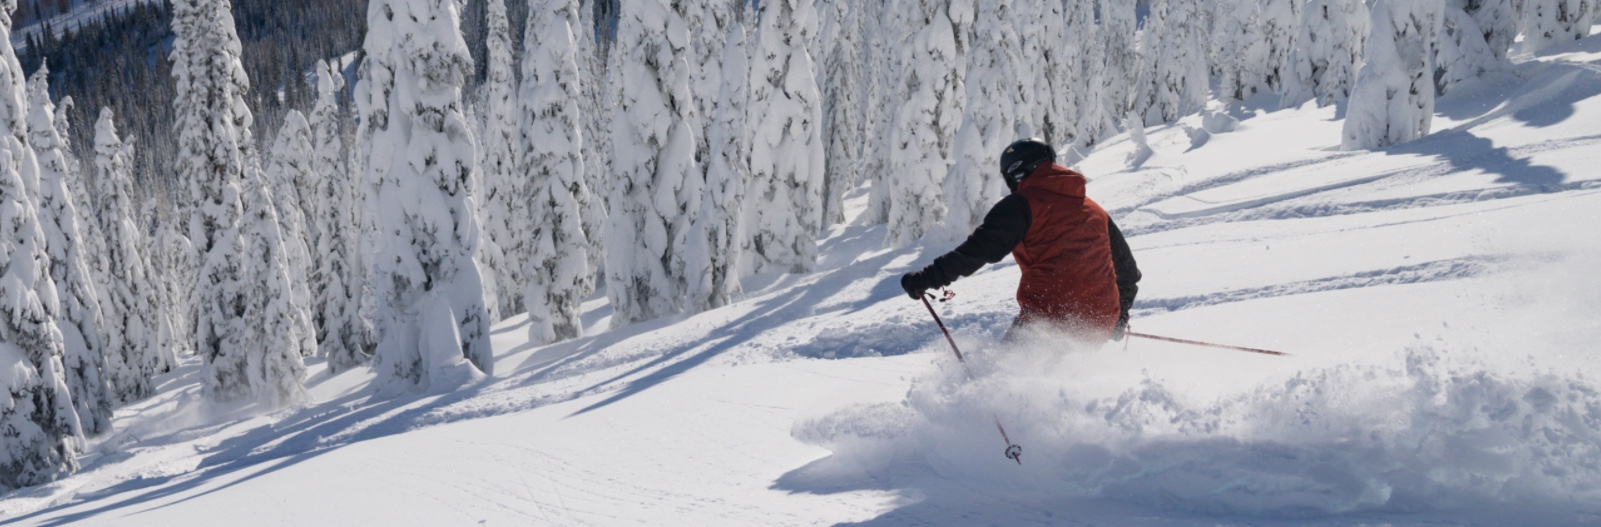 Directions on how to get to Schweitzer Mountain Resort